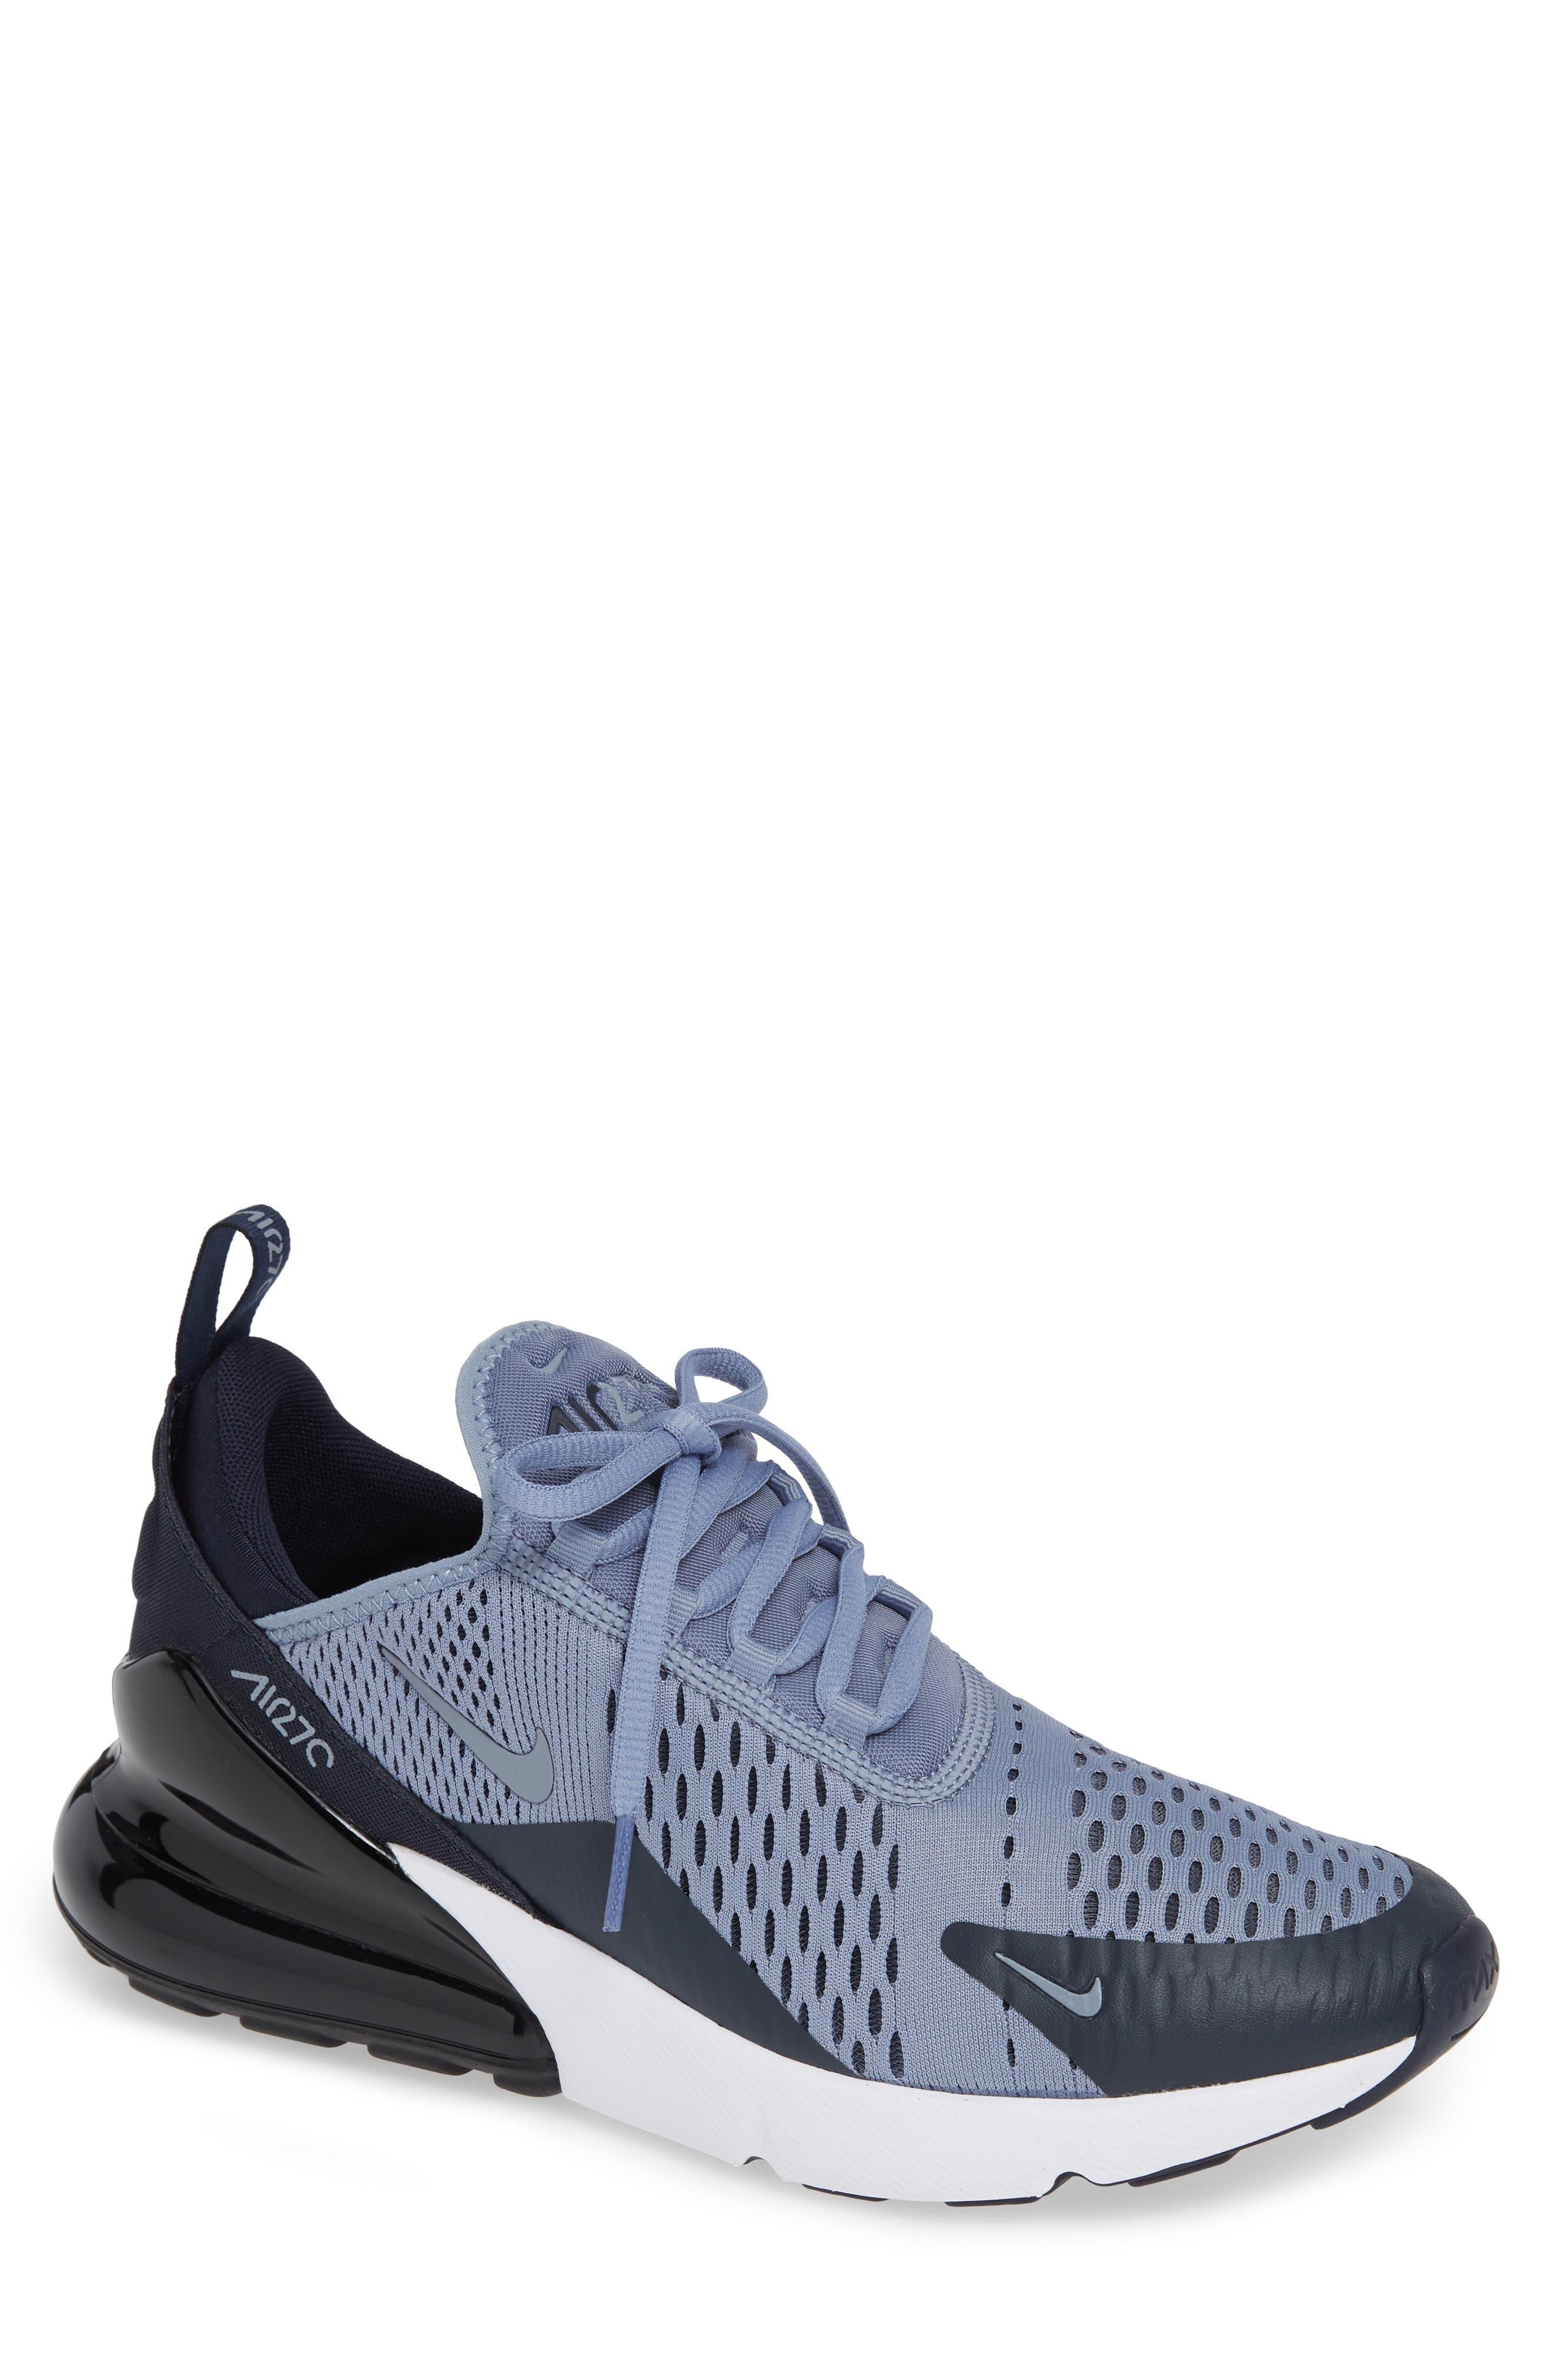 Air Max 270 Sneaker,                             Main thumbnail 1, color,                             ASHEN SLATE/ BLACK